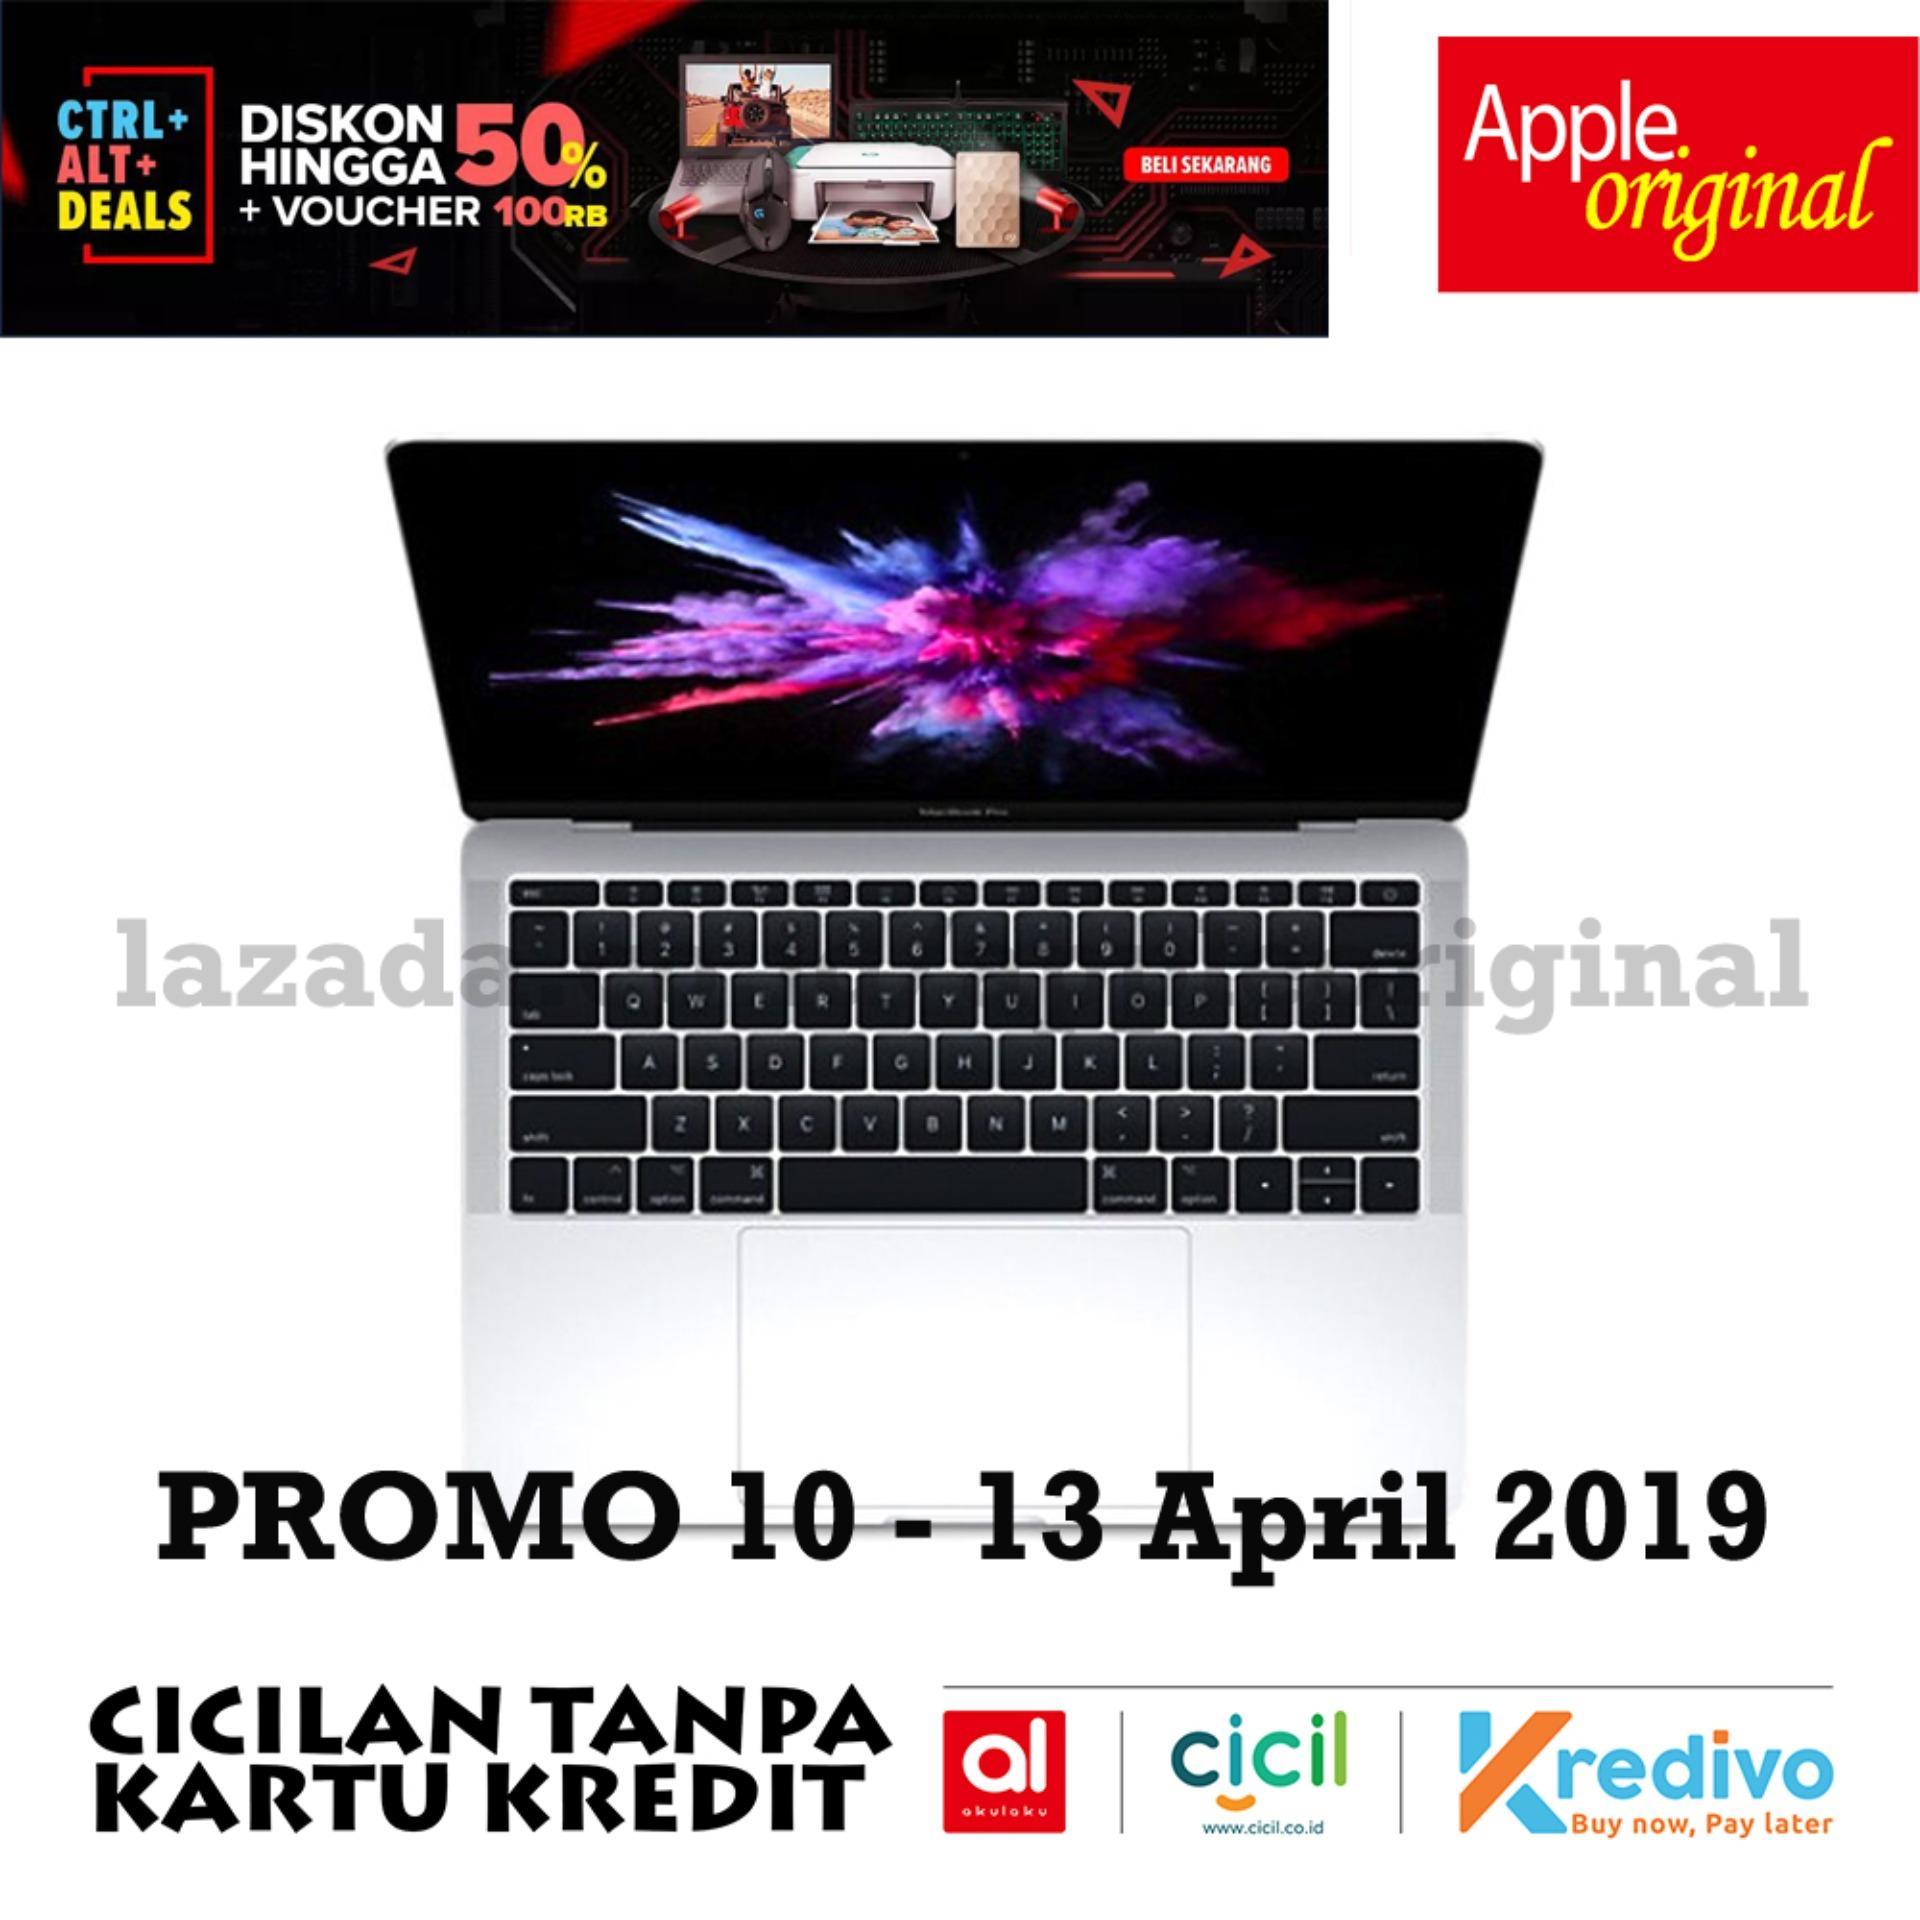 Apple Macbook Pro 2017 MPXR2 13 Inch - Dualcore i5 - 2.3Ghz Intel Iris Plus Graphics 640 - 8GB - 128GB - Silver